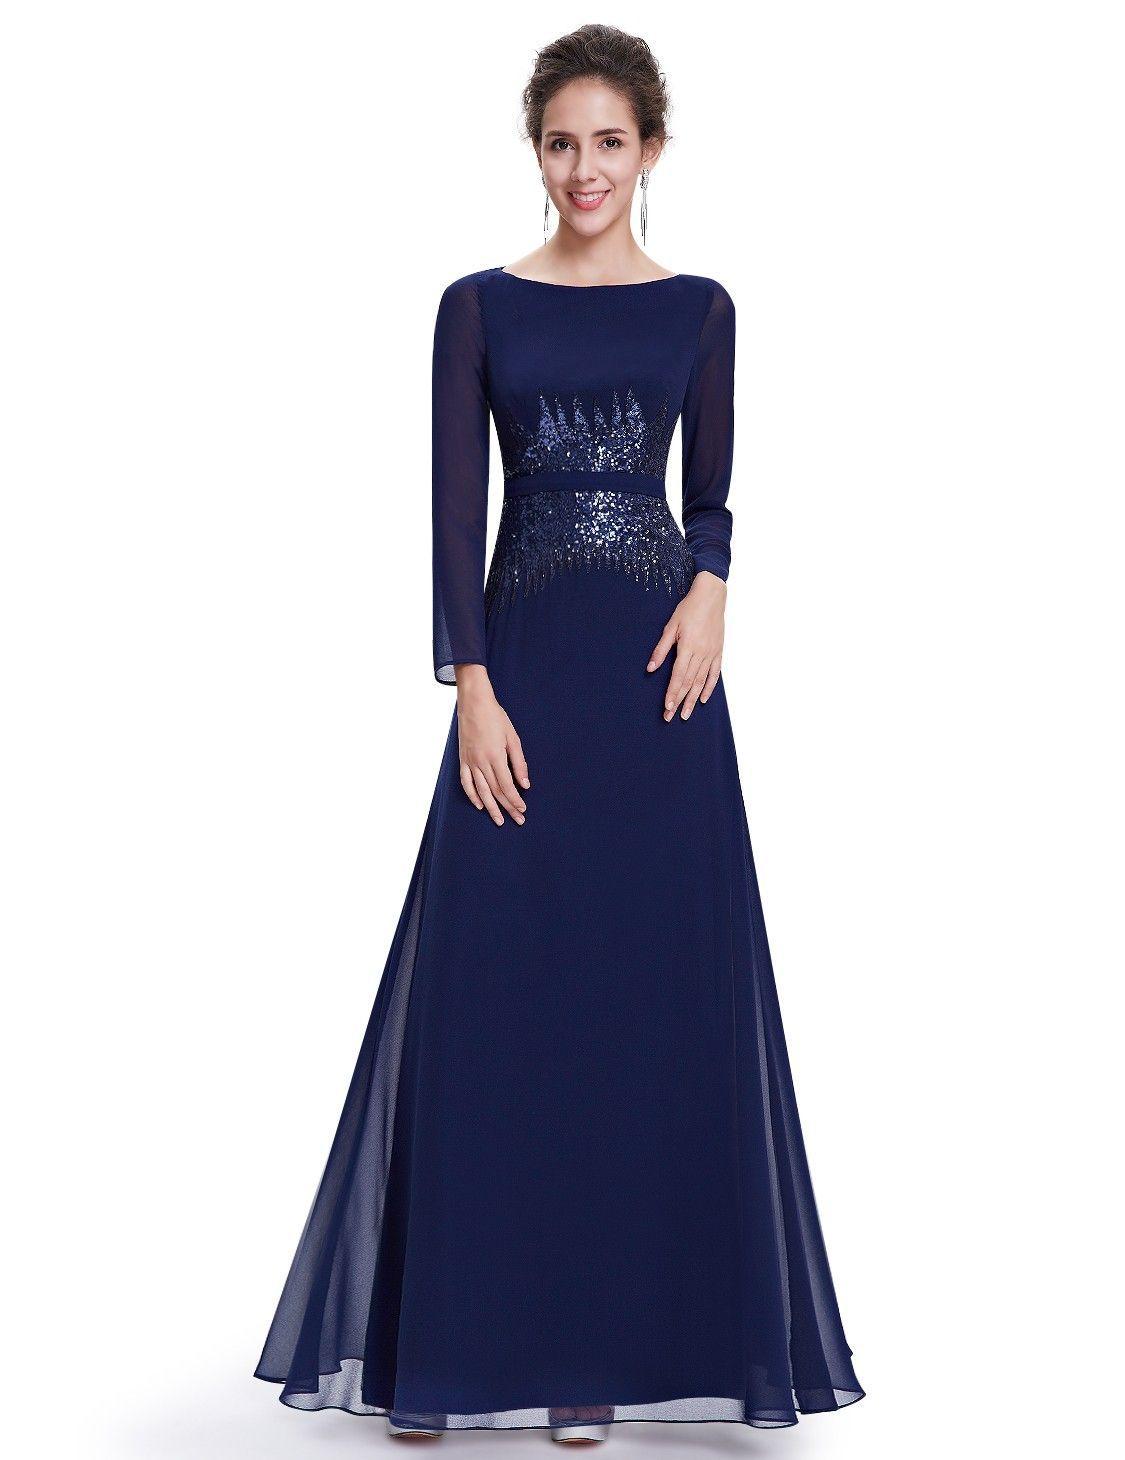 Abendmode / Langarm Abendkleid in Blau  Abendkleid, Chiffon